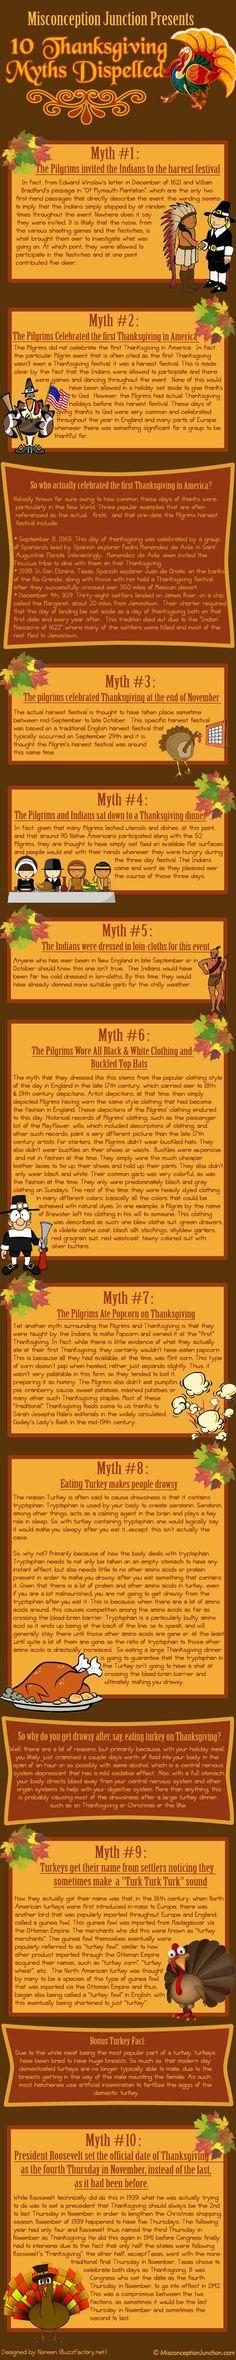 10 Myths of Thanksgiving